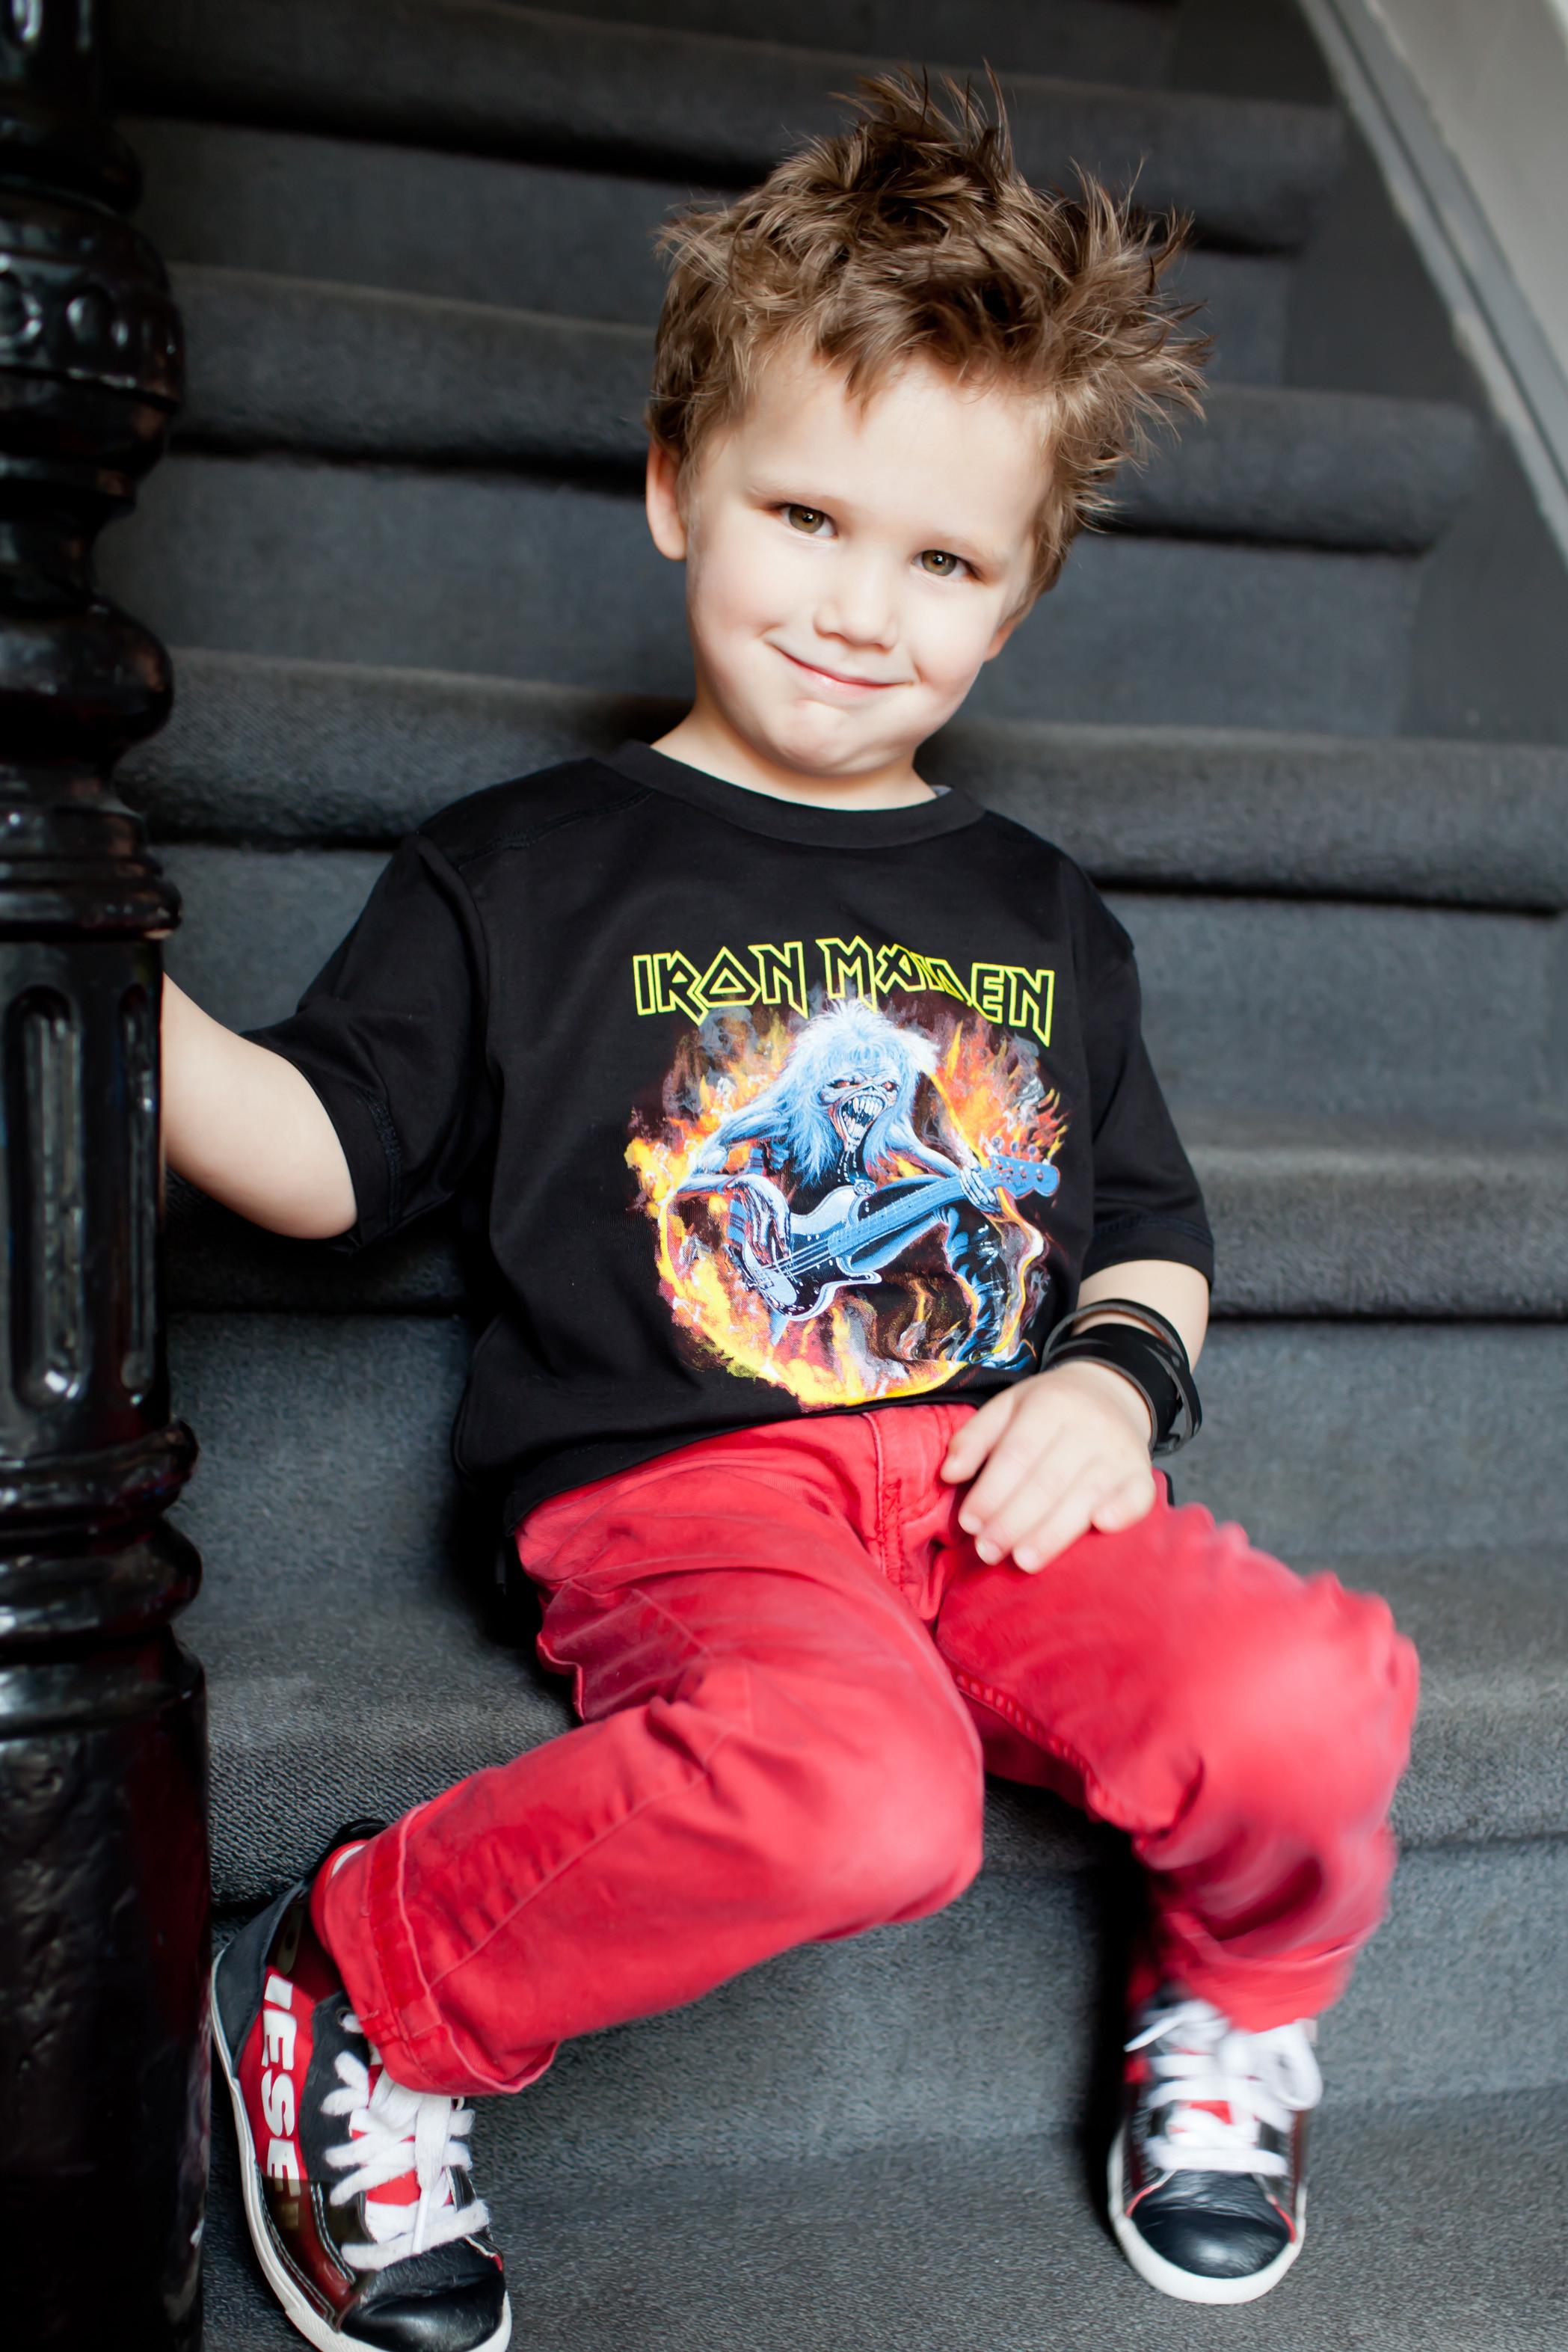 Iron Maiden t-shirt Enfant FLF Metal-Kids